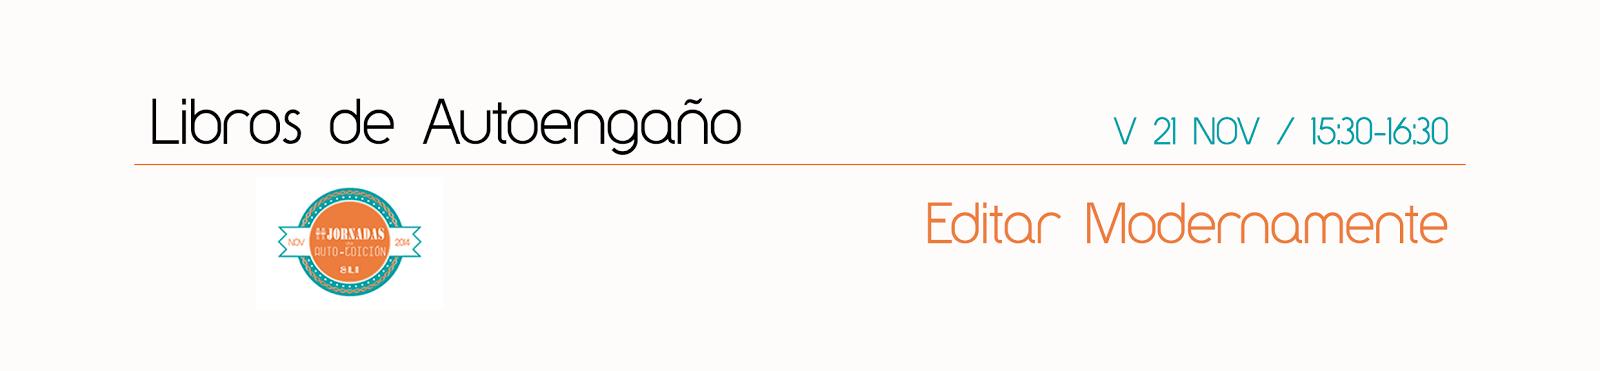 http://www.librosdeautoengano.com/